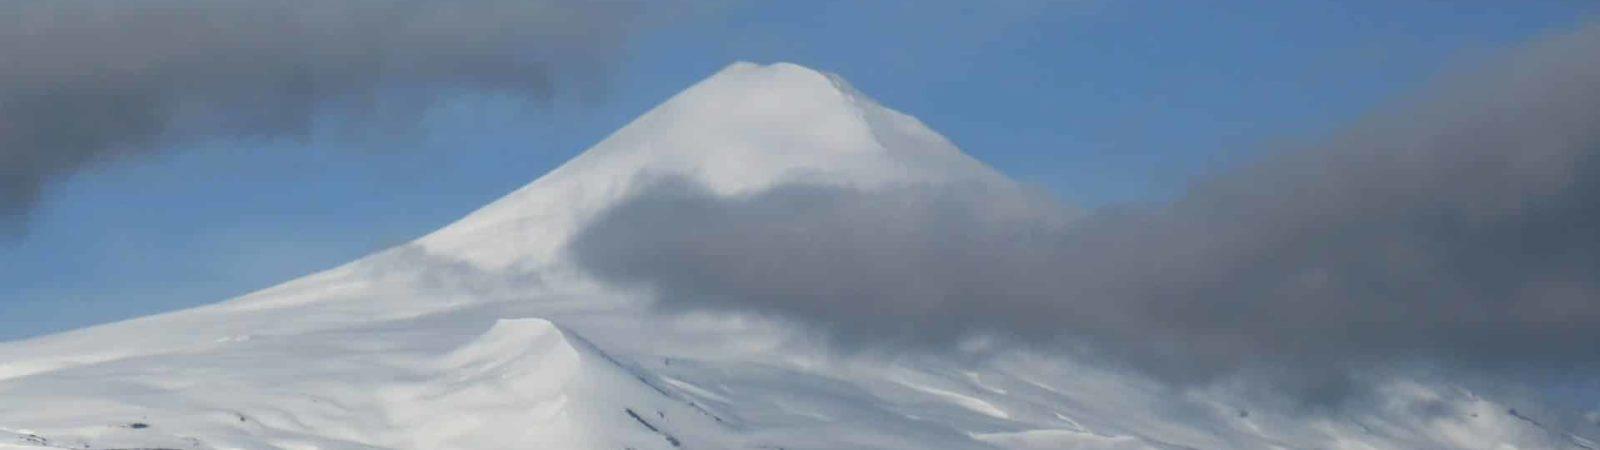 8-day ski tour on Chile's volcanoes